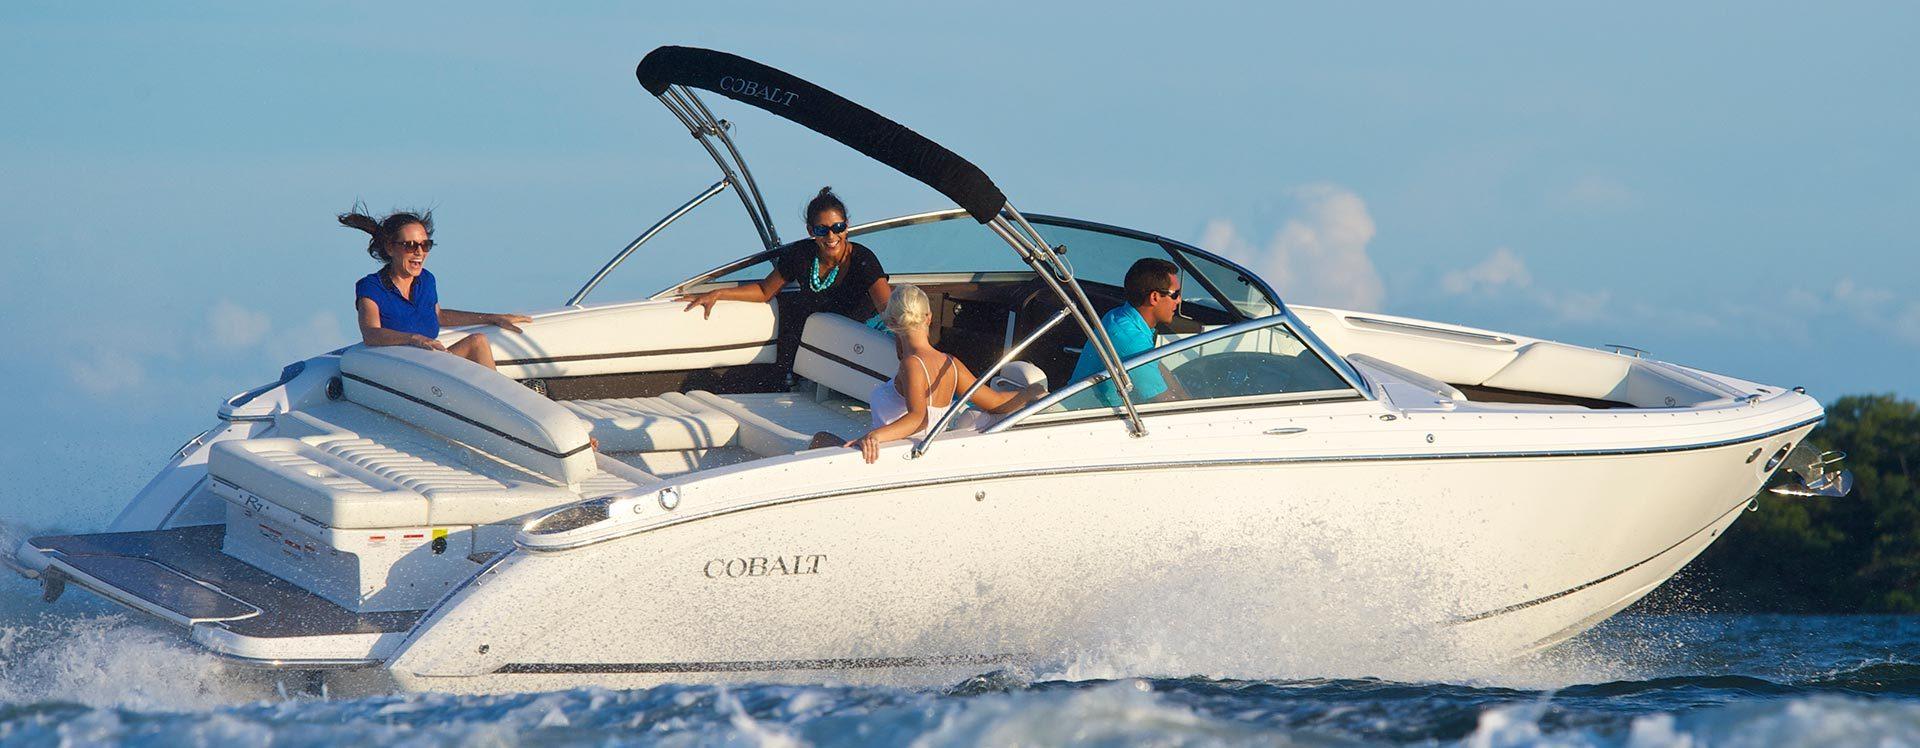 CObalt new boat models